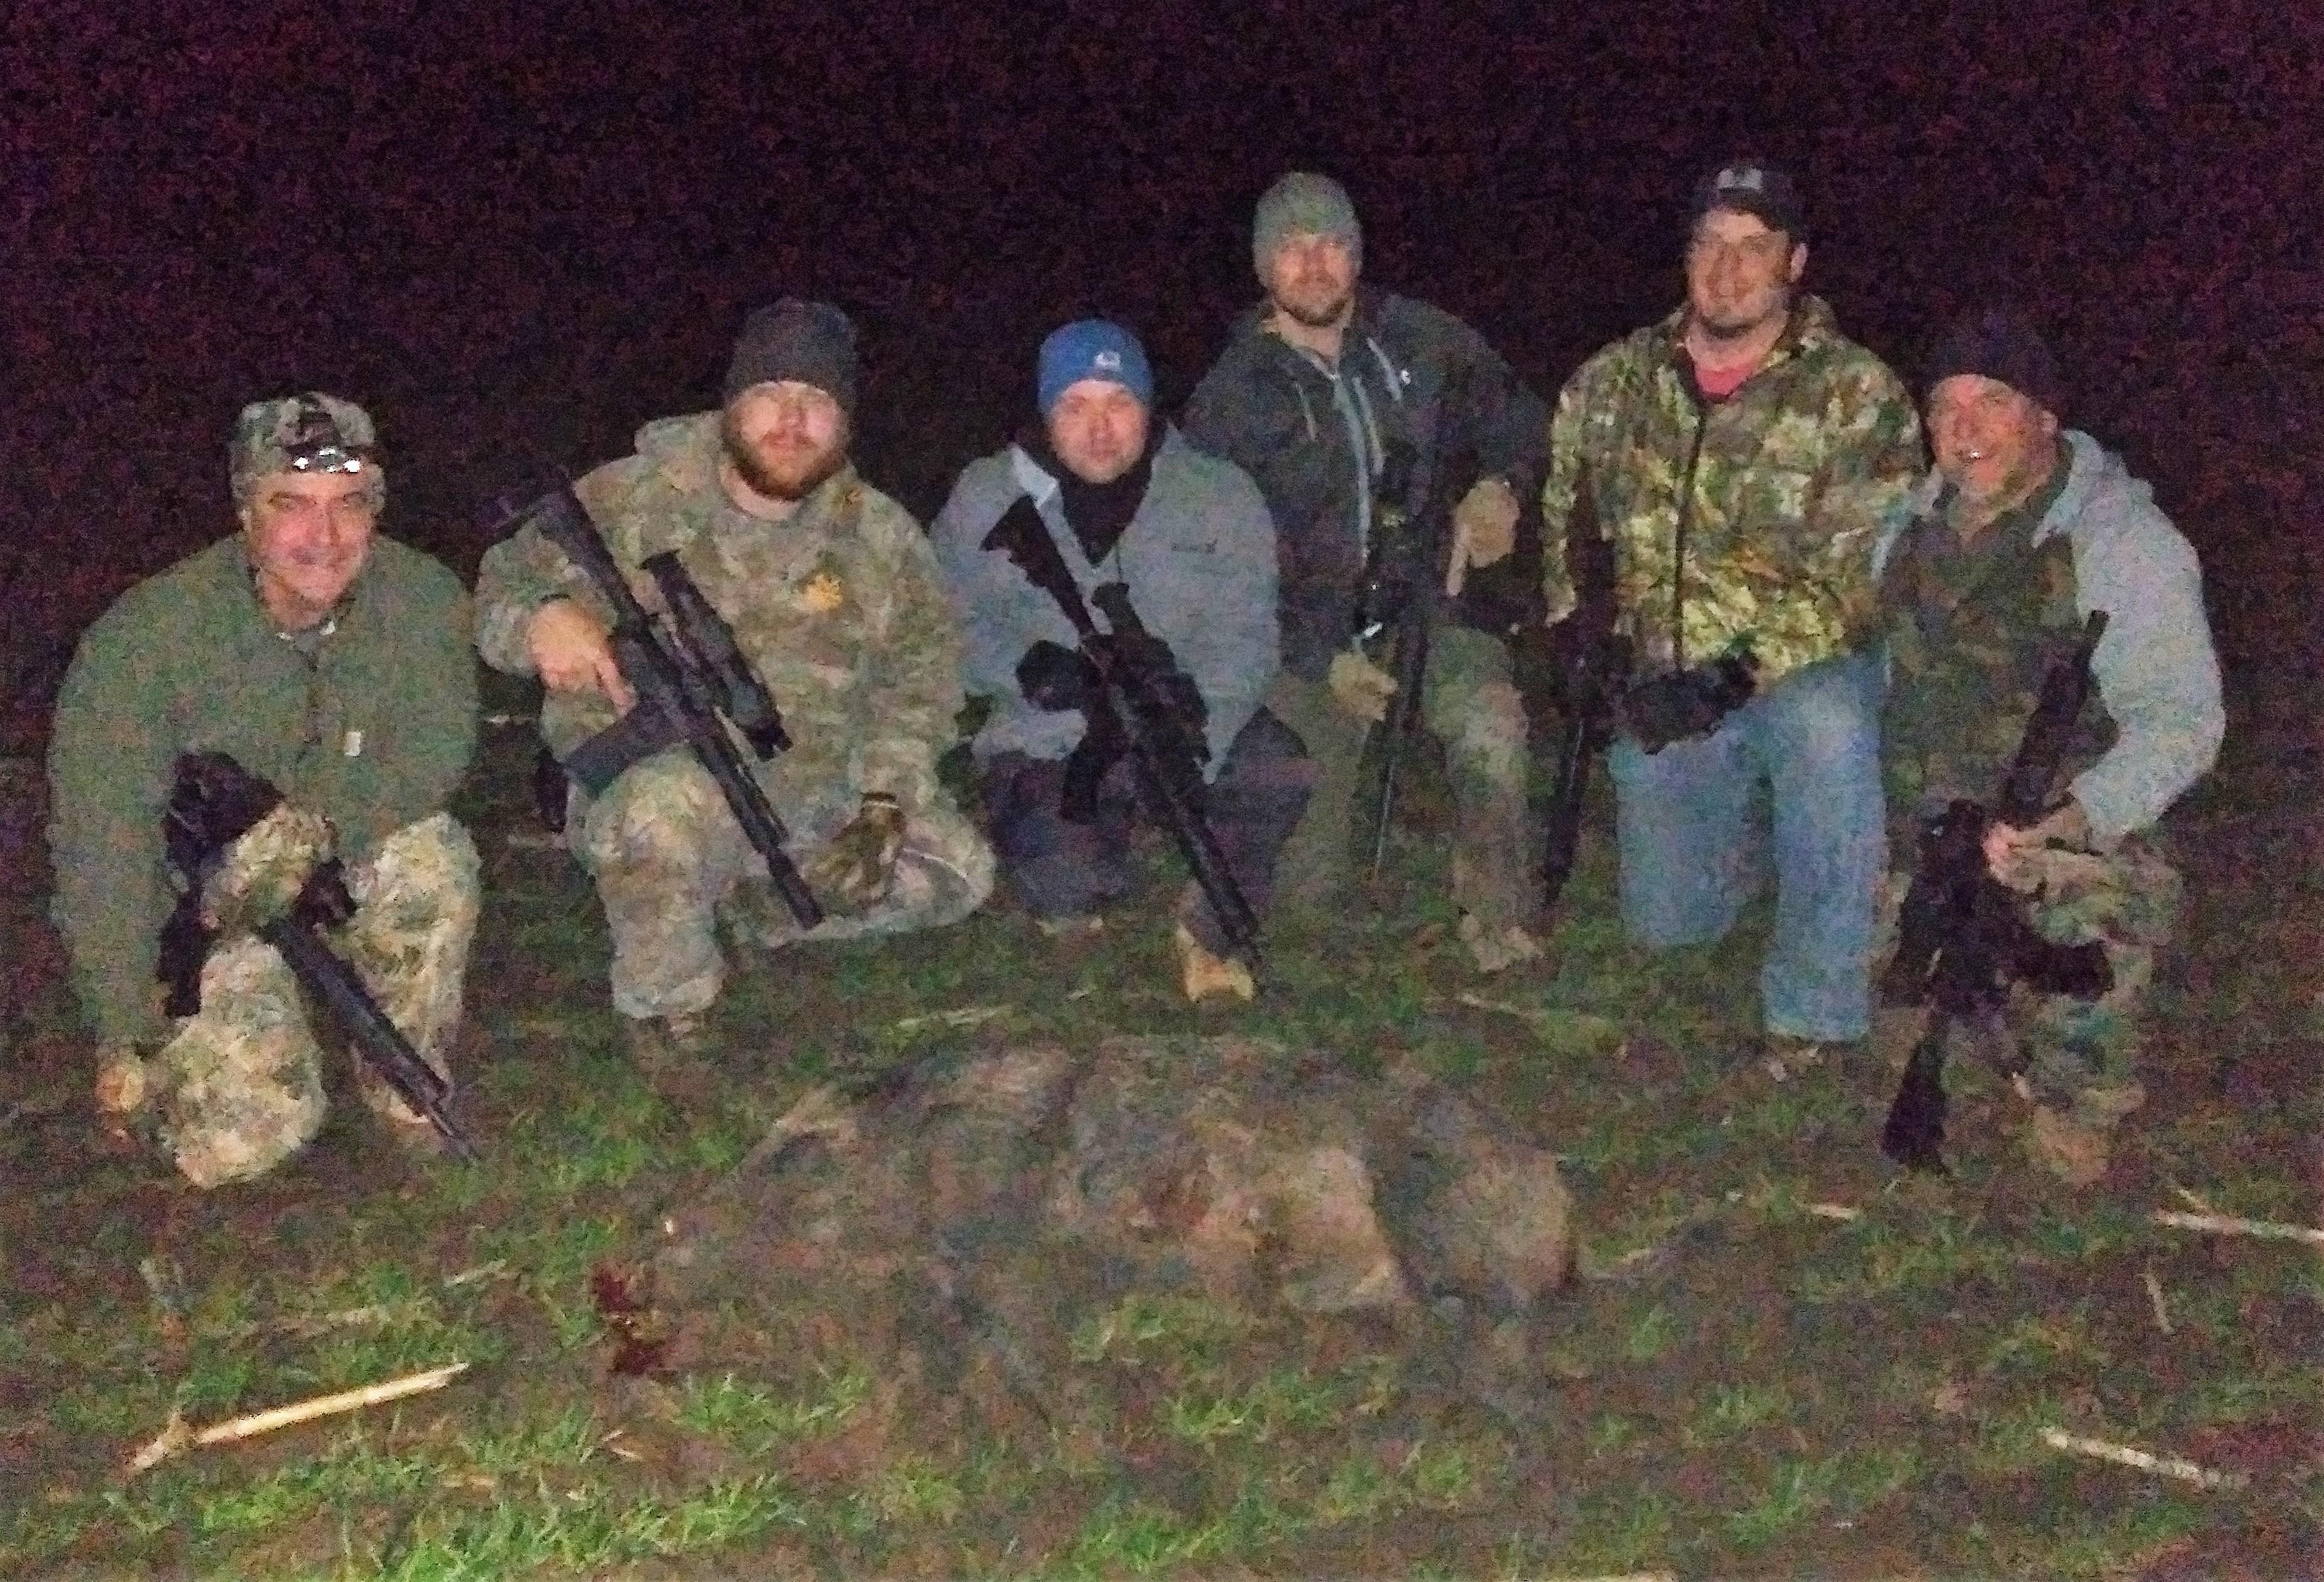 2019 hunting